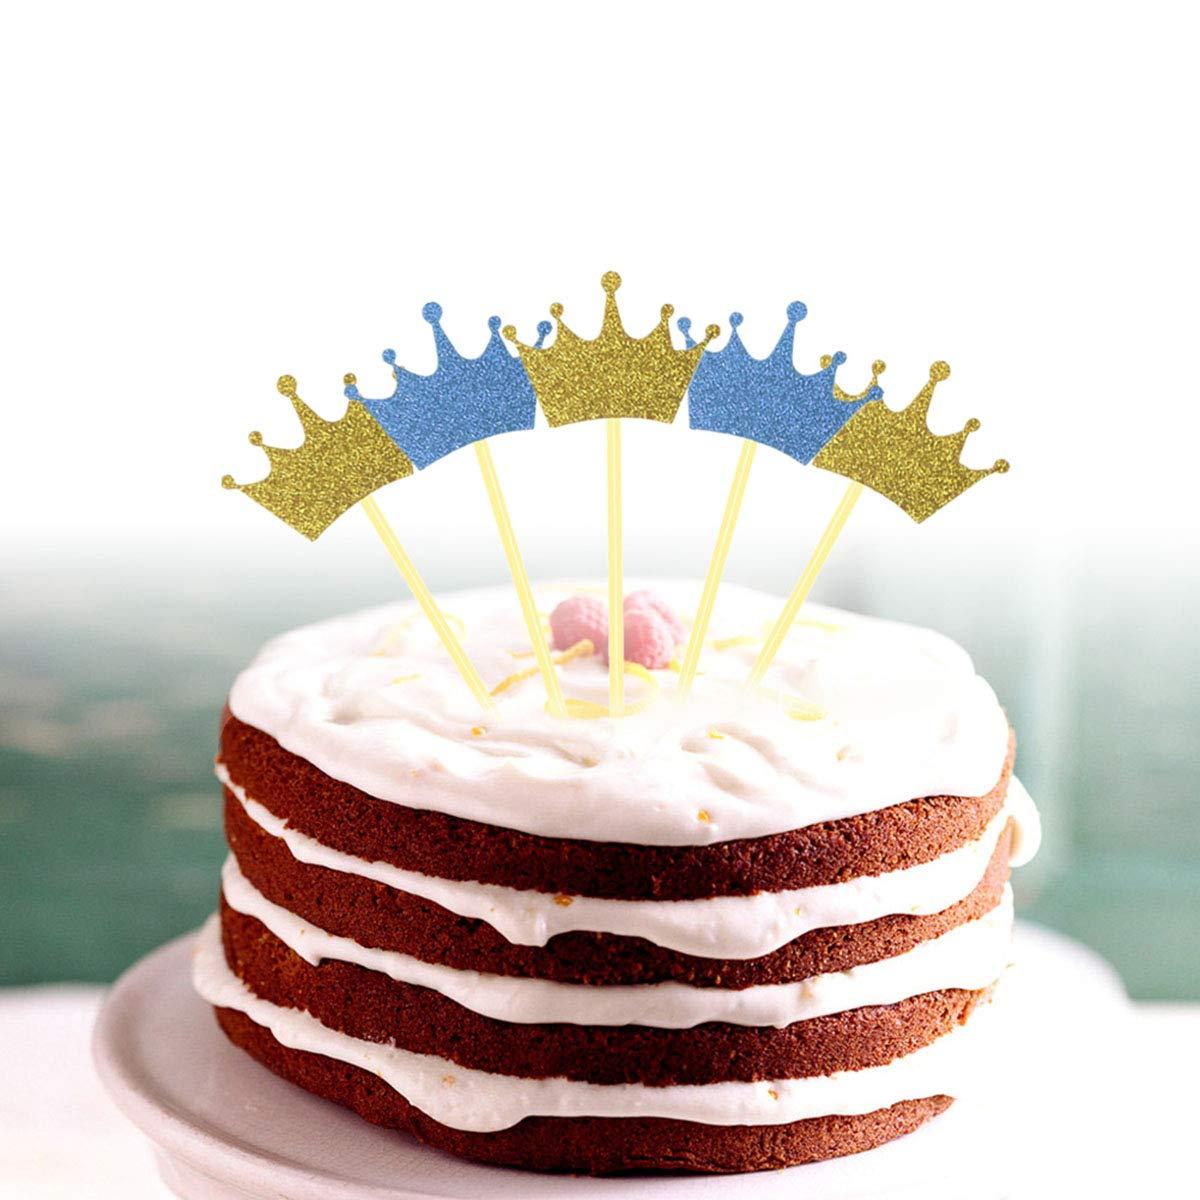 20pcs Glitter Paper Happy Birthday Cake Topper Cupcake SticksFood Picks